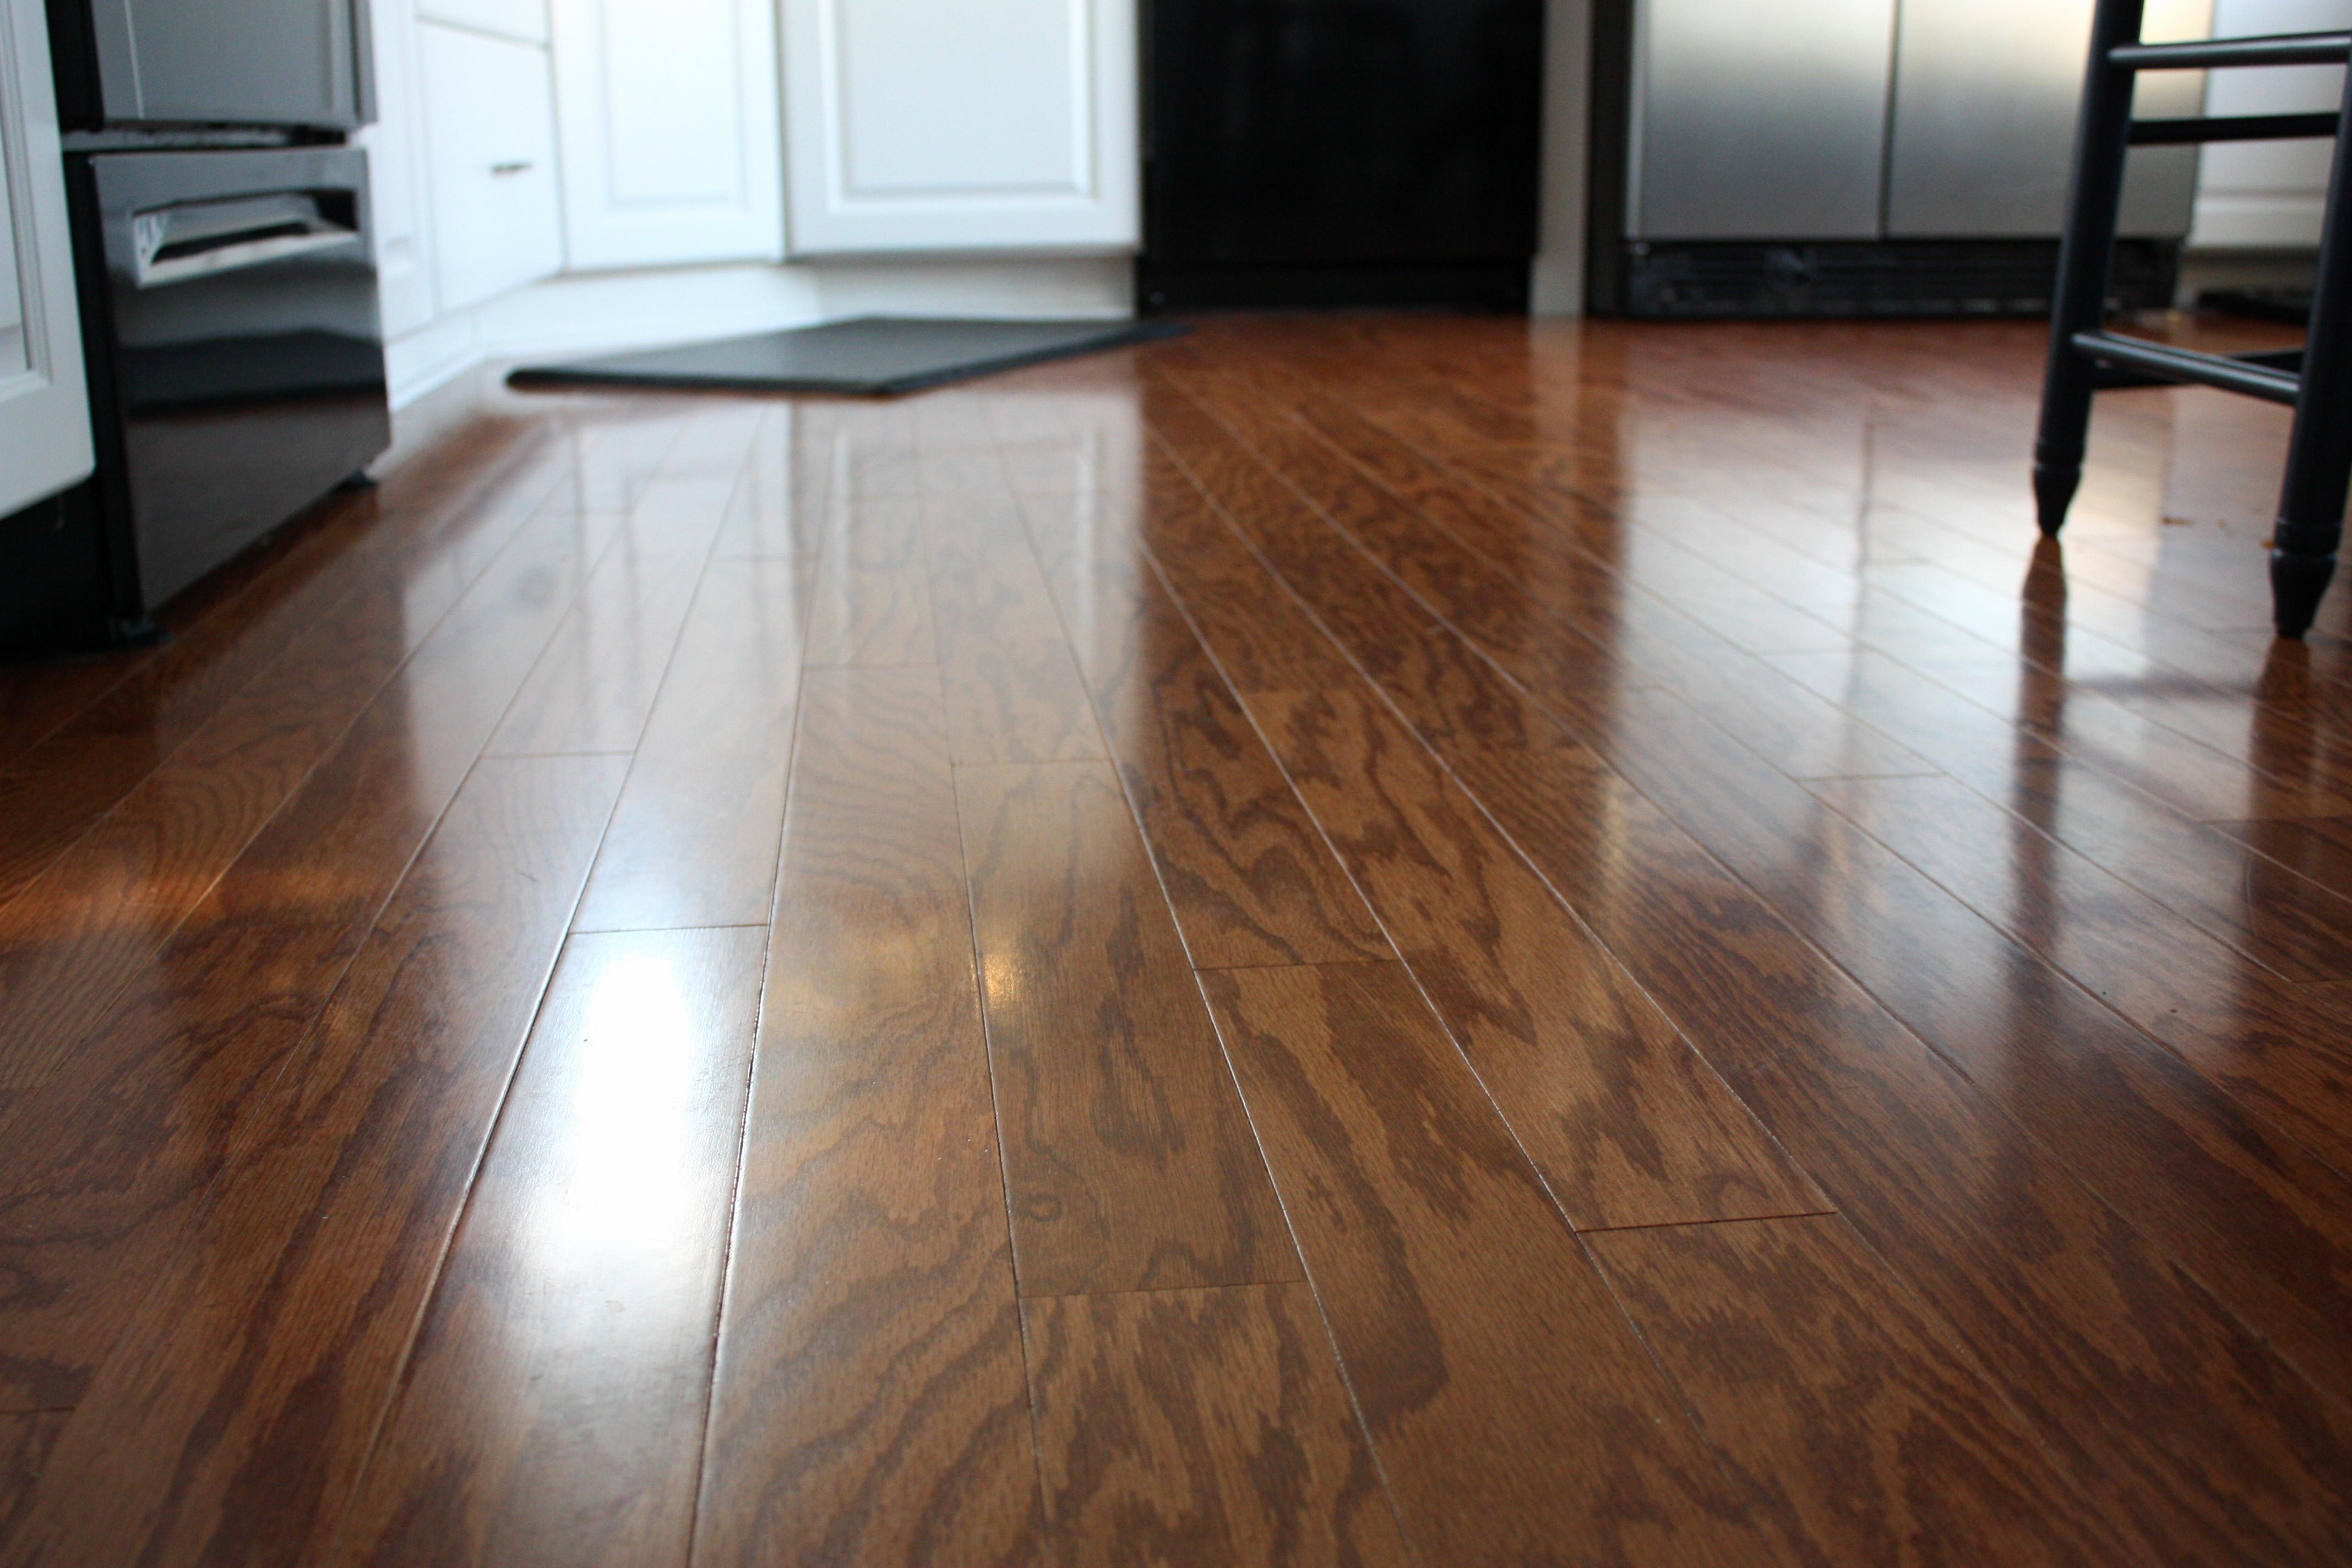 hardwood floor repair filler of the wood maker page 6 wood wallpaper regarding floor floorod cleaning hardwood carpet lake forest il rare image ideas of wood floor steam cleaner